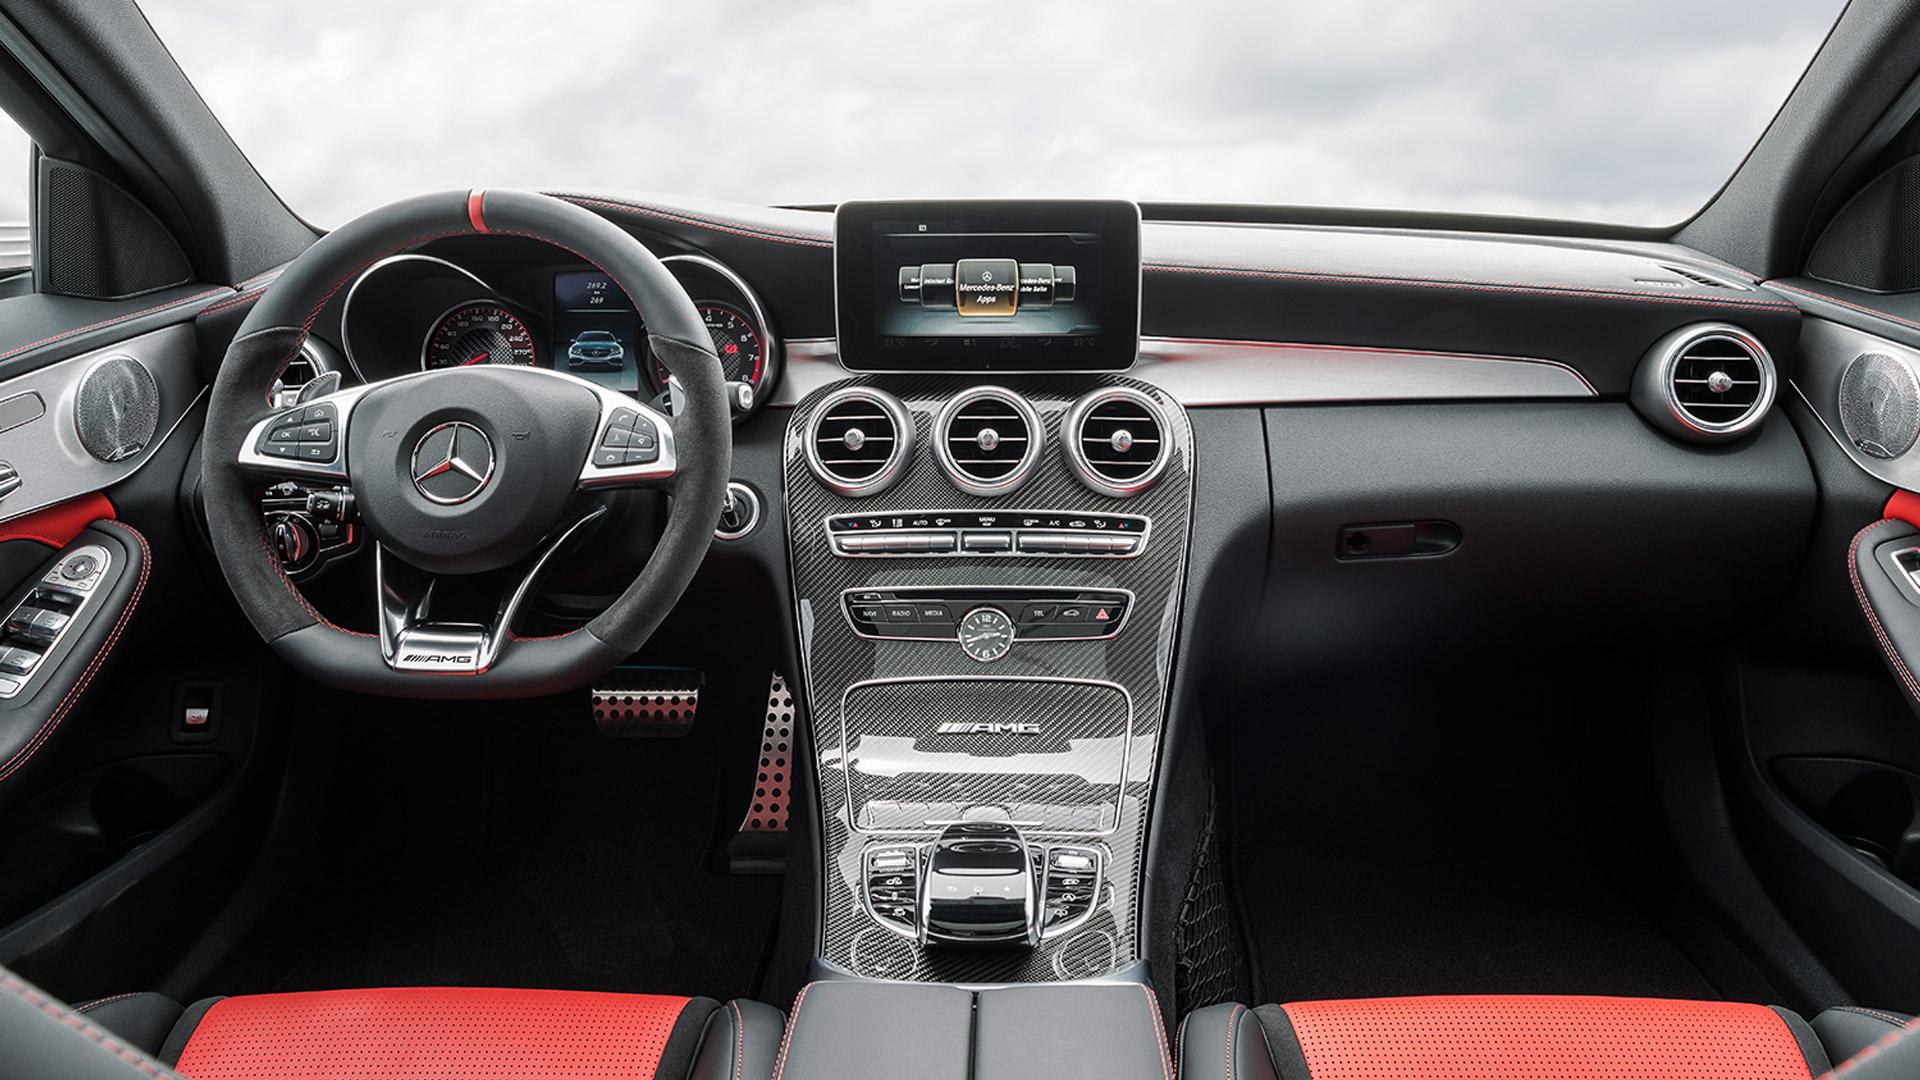 Mercedes Benz C 63 AMG 2015 S Interior